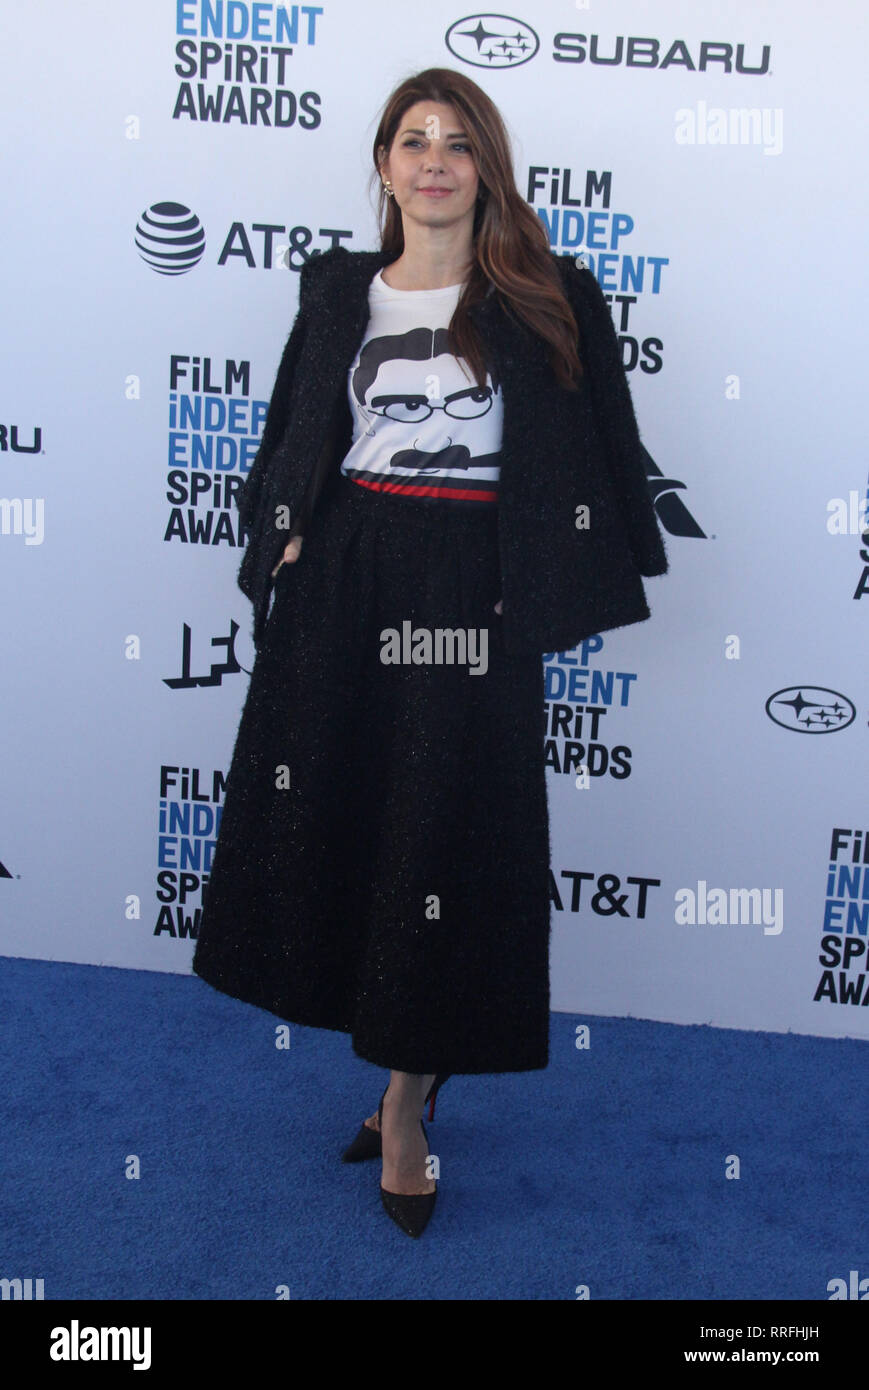 Marisa Tomei  02/23/2019 2019 Film Independent Spirit Awards in Santa Monica, CA   Photo: Cronos/Hollywood News - Stock Image